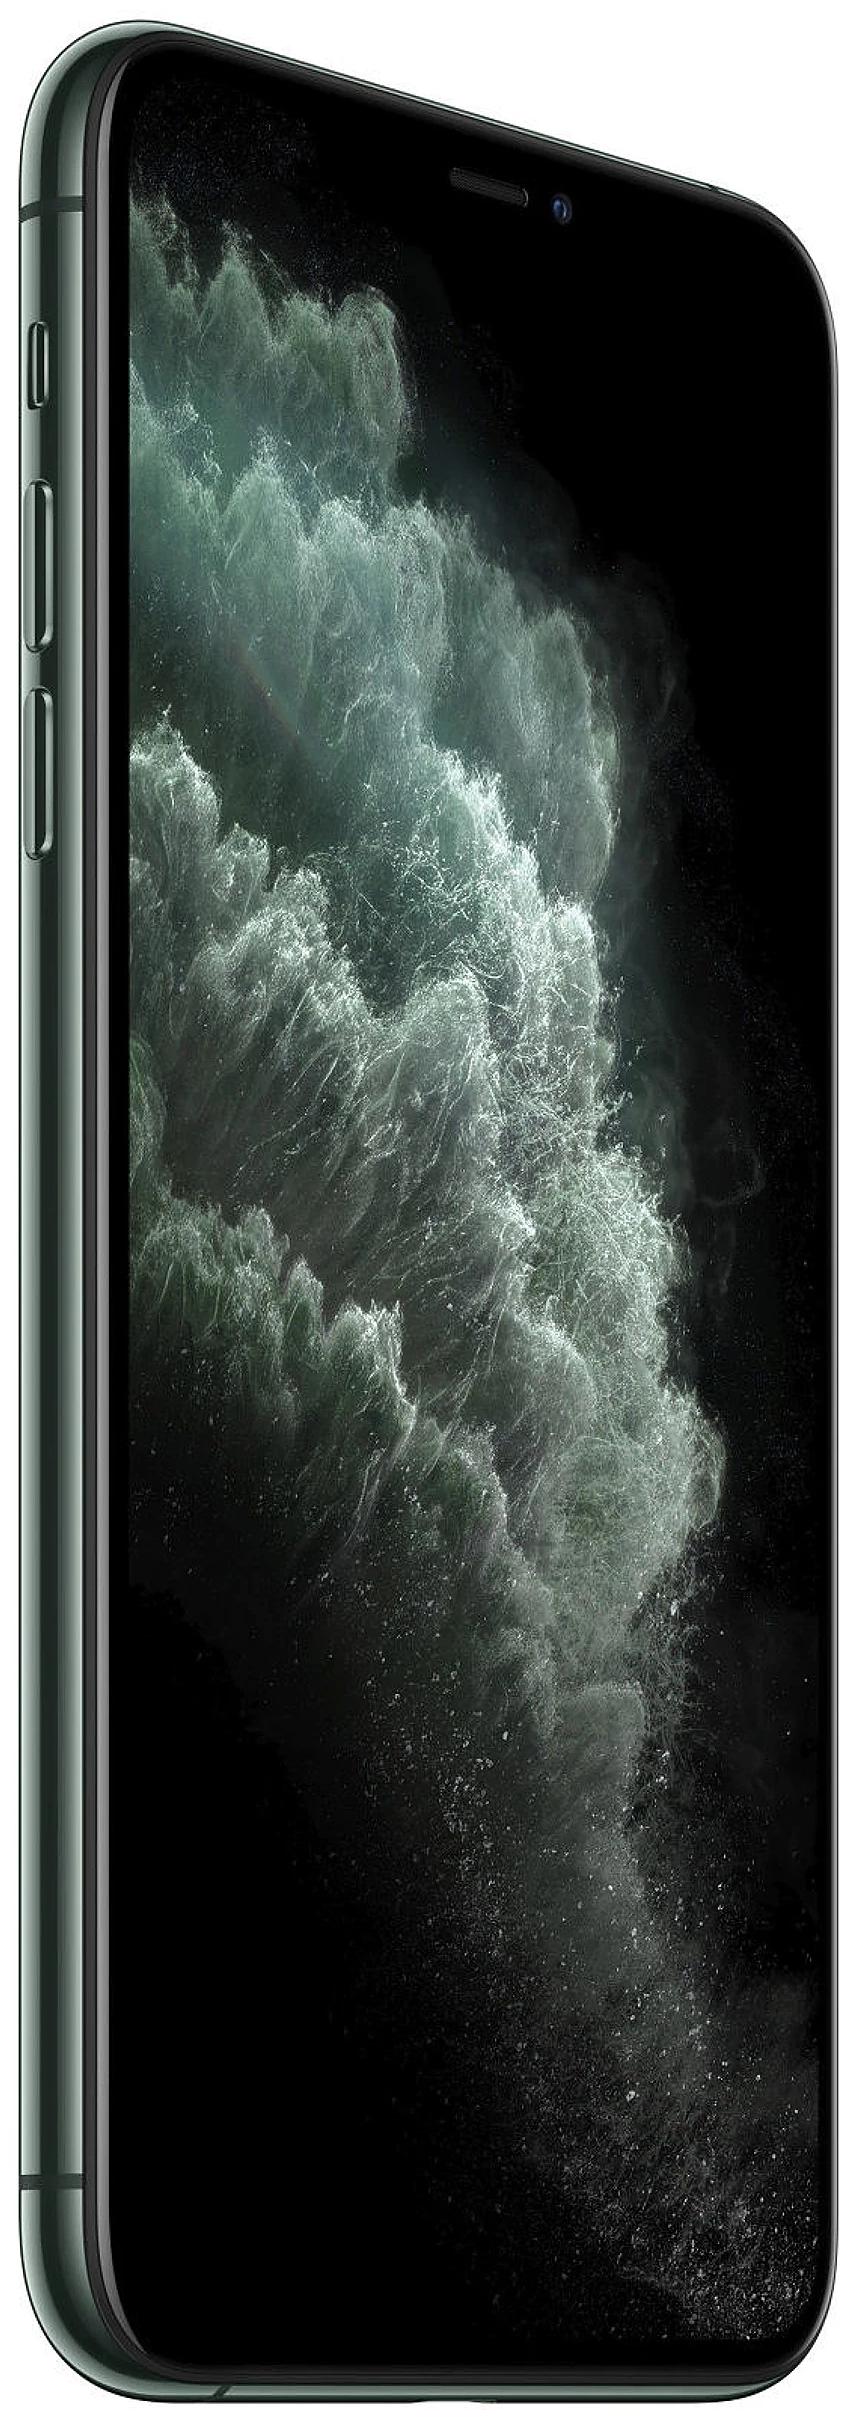 Apple iPhone 11 Pro Max 512GB - степень защиты: IP68